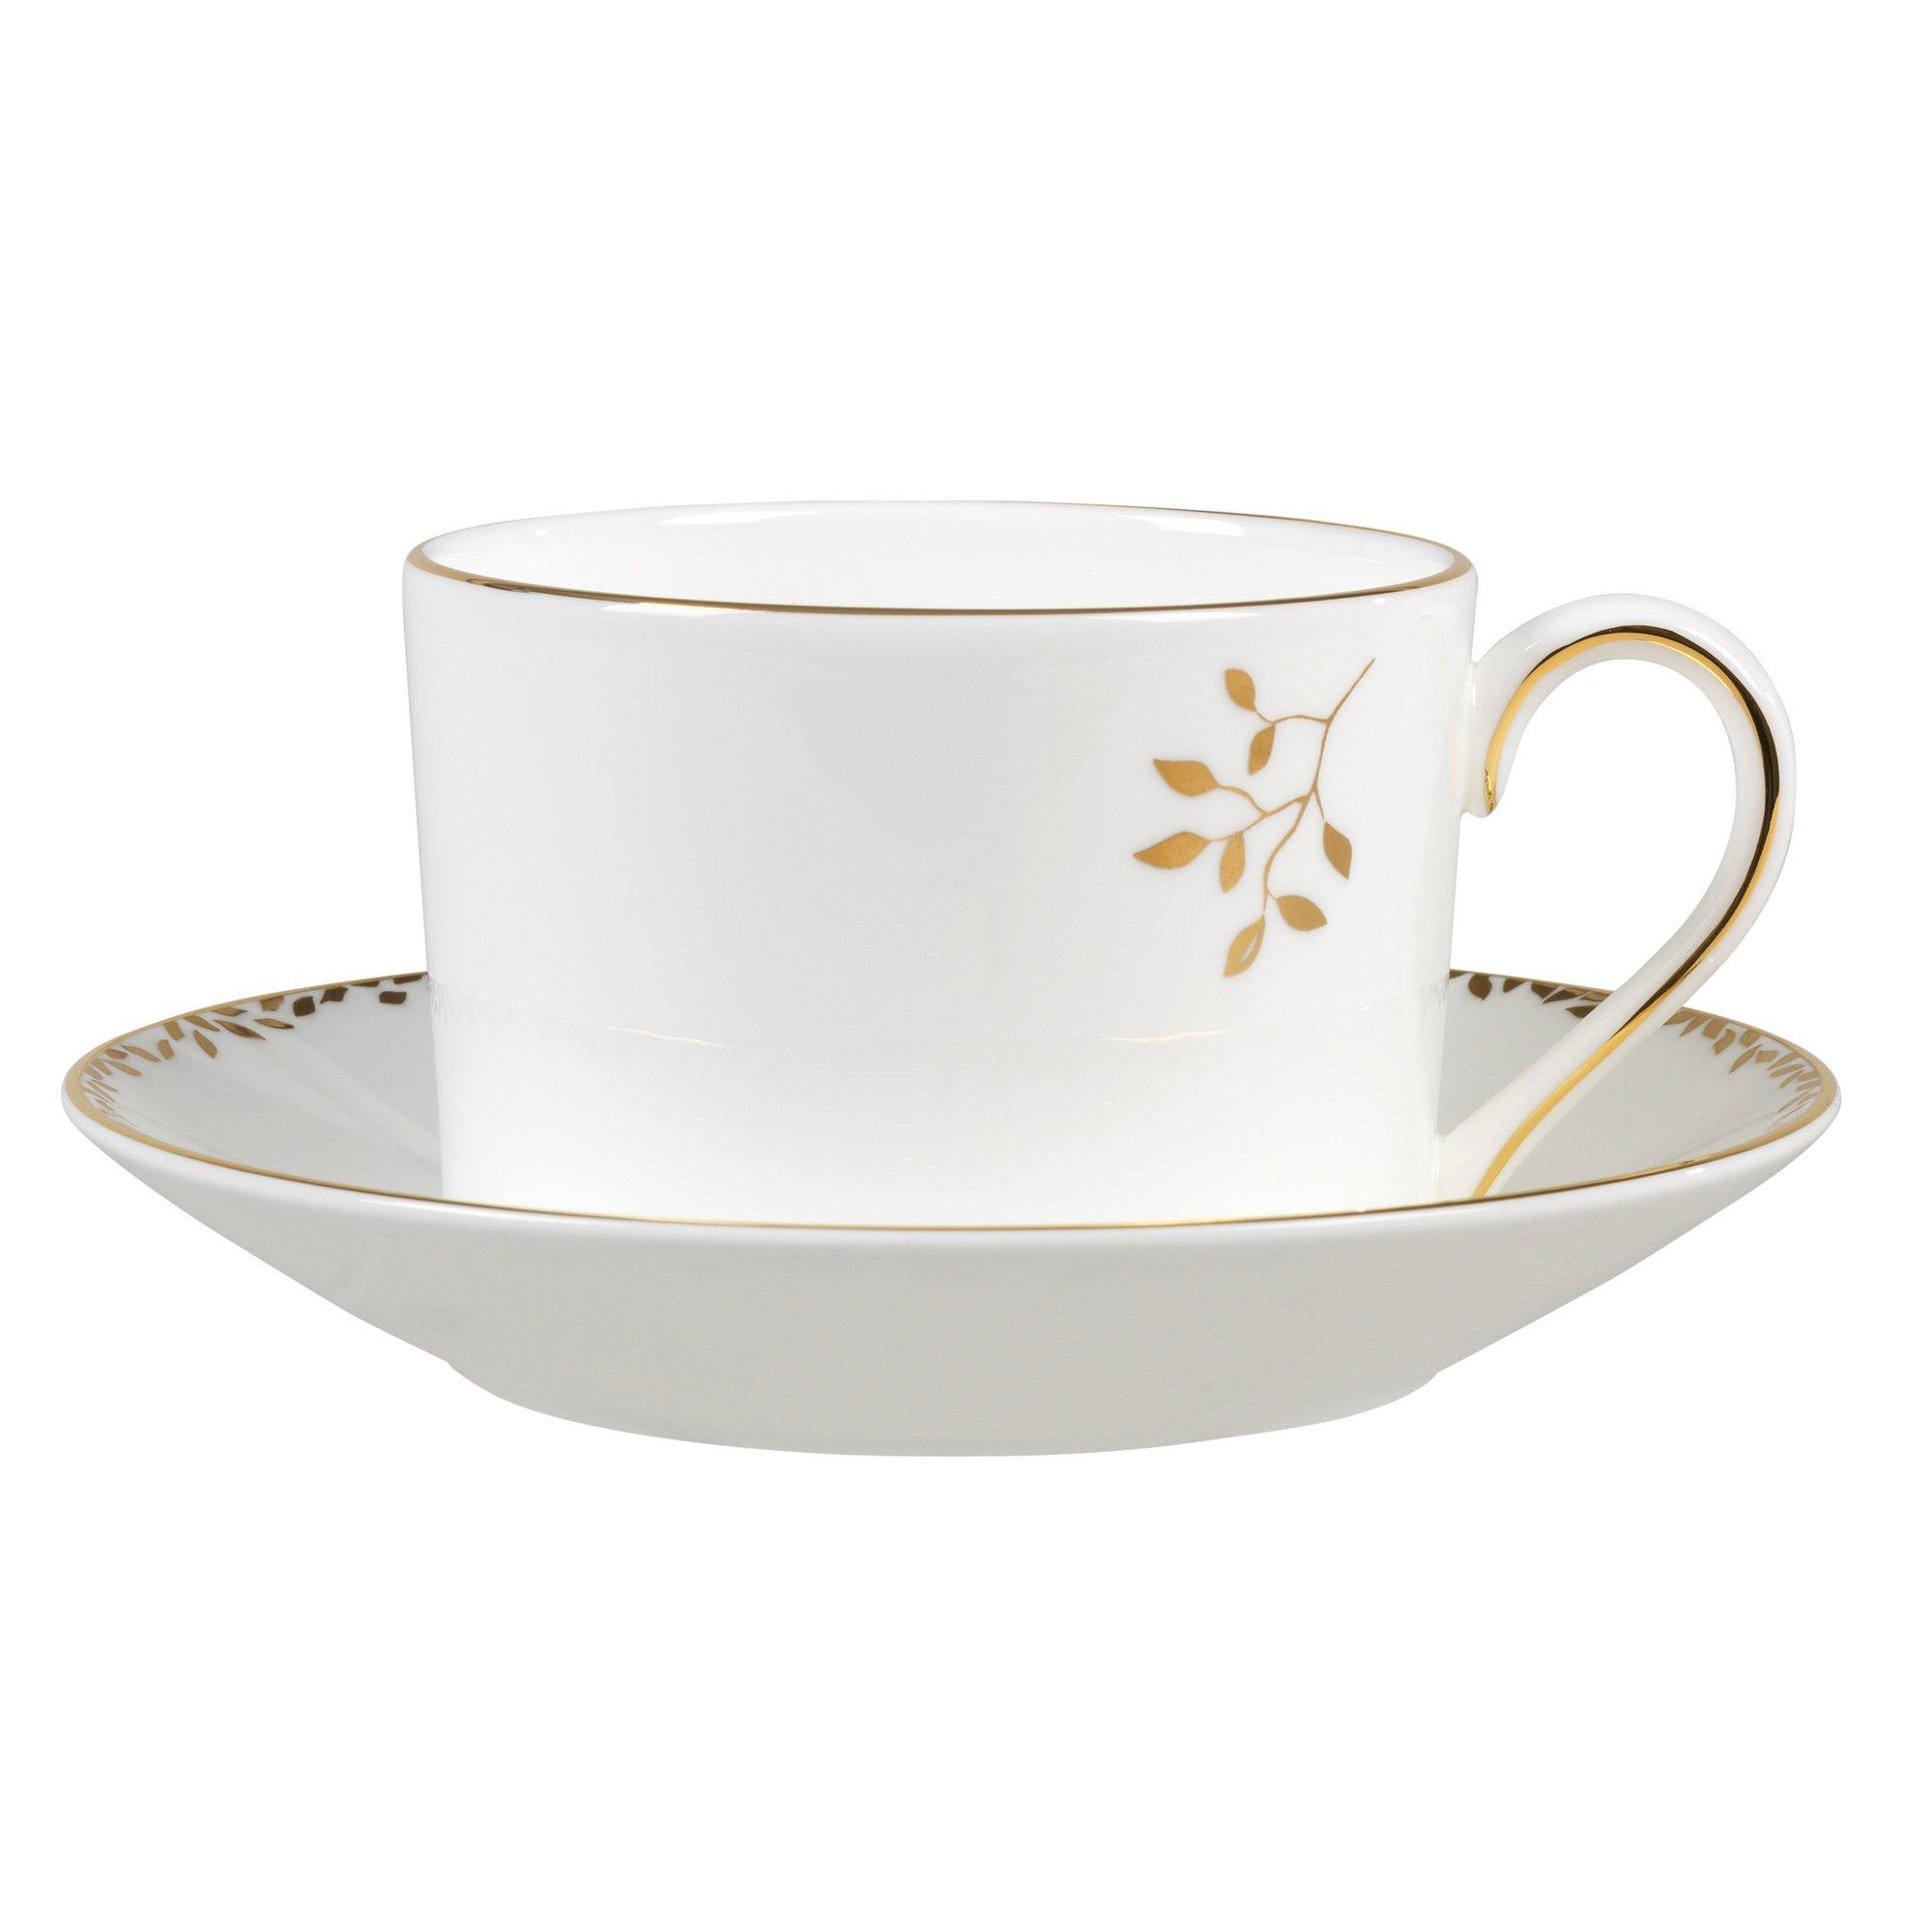 Wedgwood Gilded Leaf Tea Saucer Imperial, White